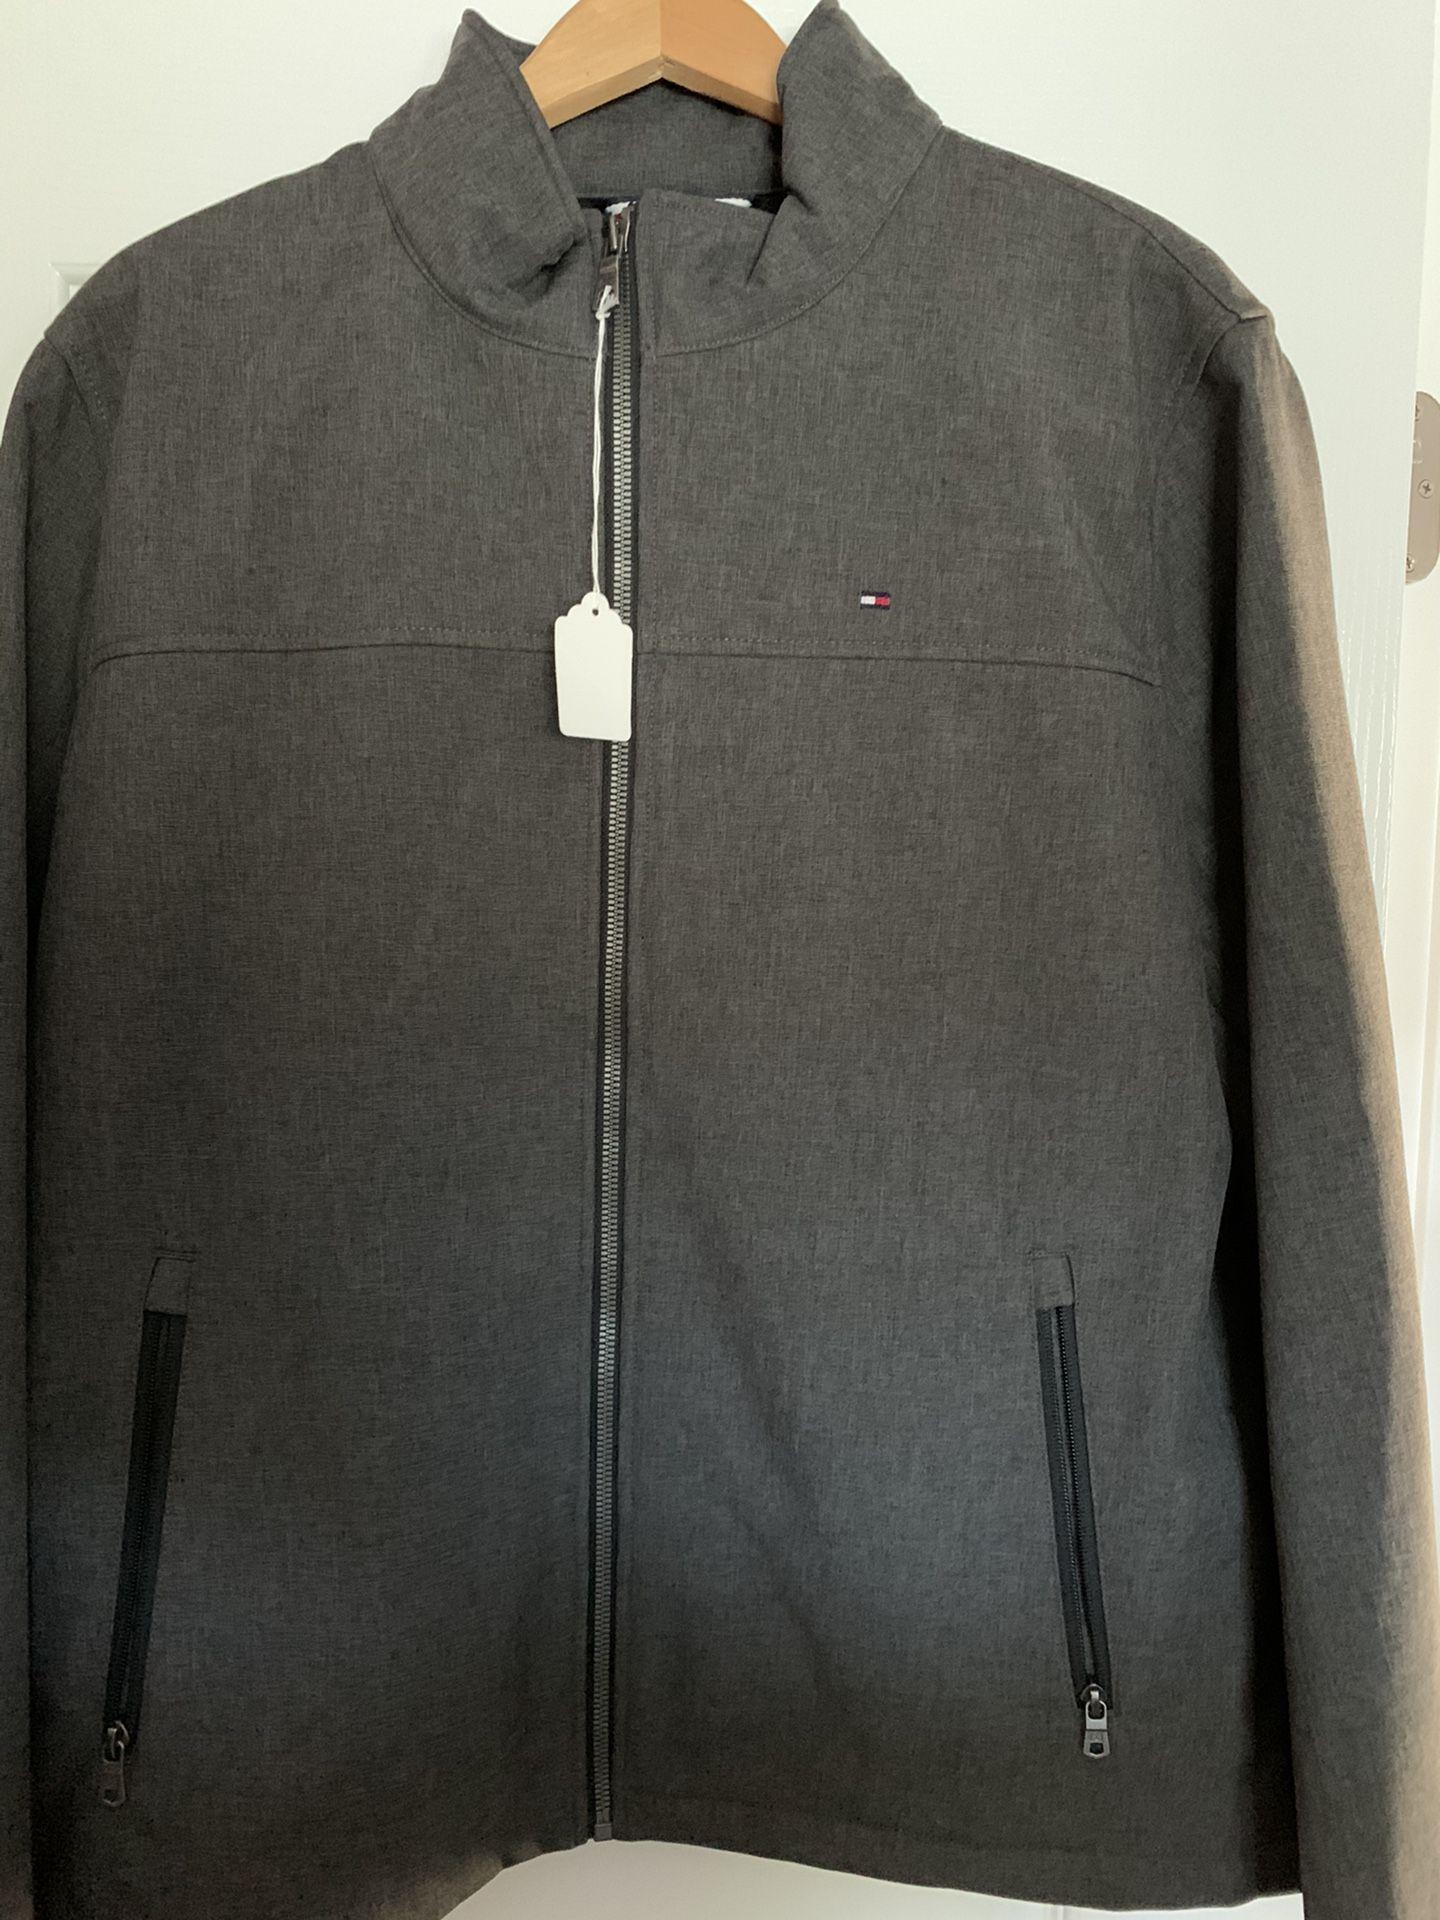 Men's Tommy Hilfiger Brand Zippered Jacket Size Largr Dark Gray.